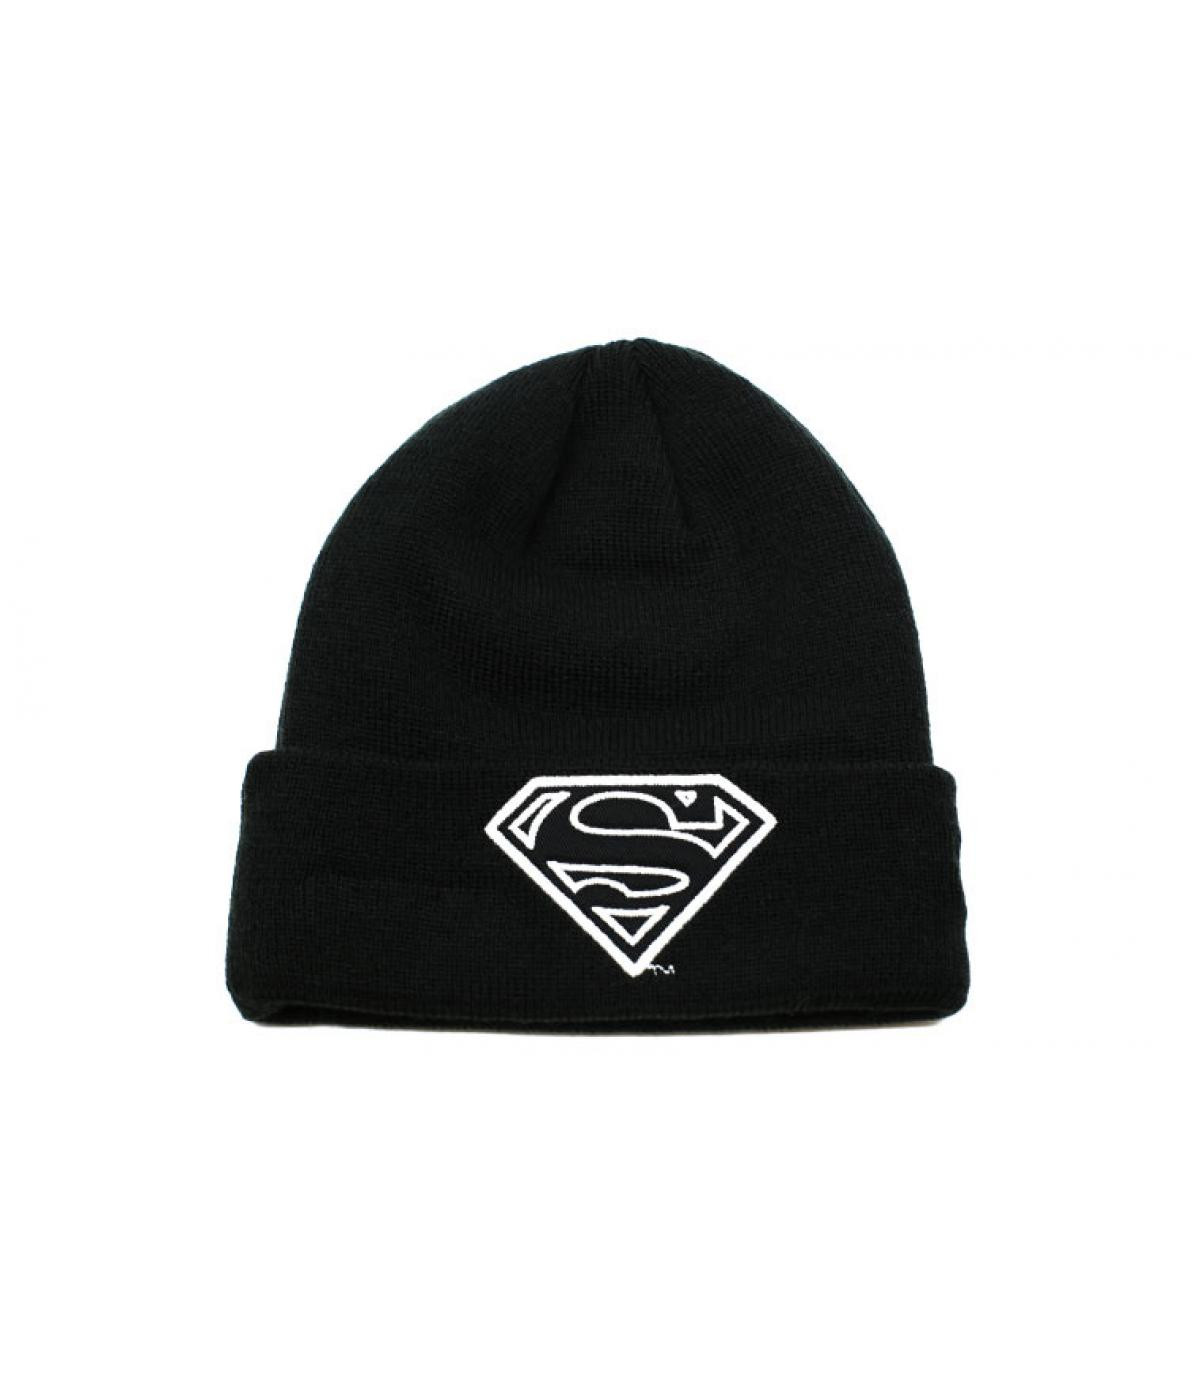 51b9b14a2b8 Superman child glowing beanie - Kids GITD Knit Superman by New Era ...